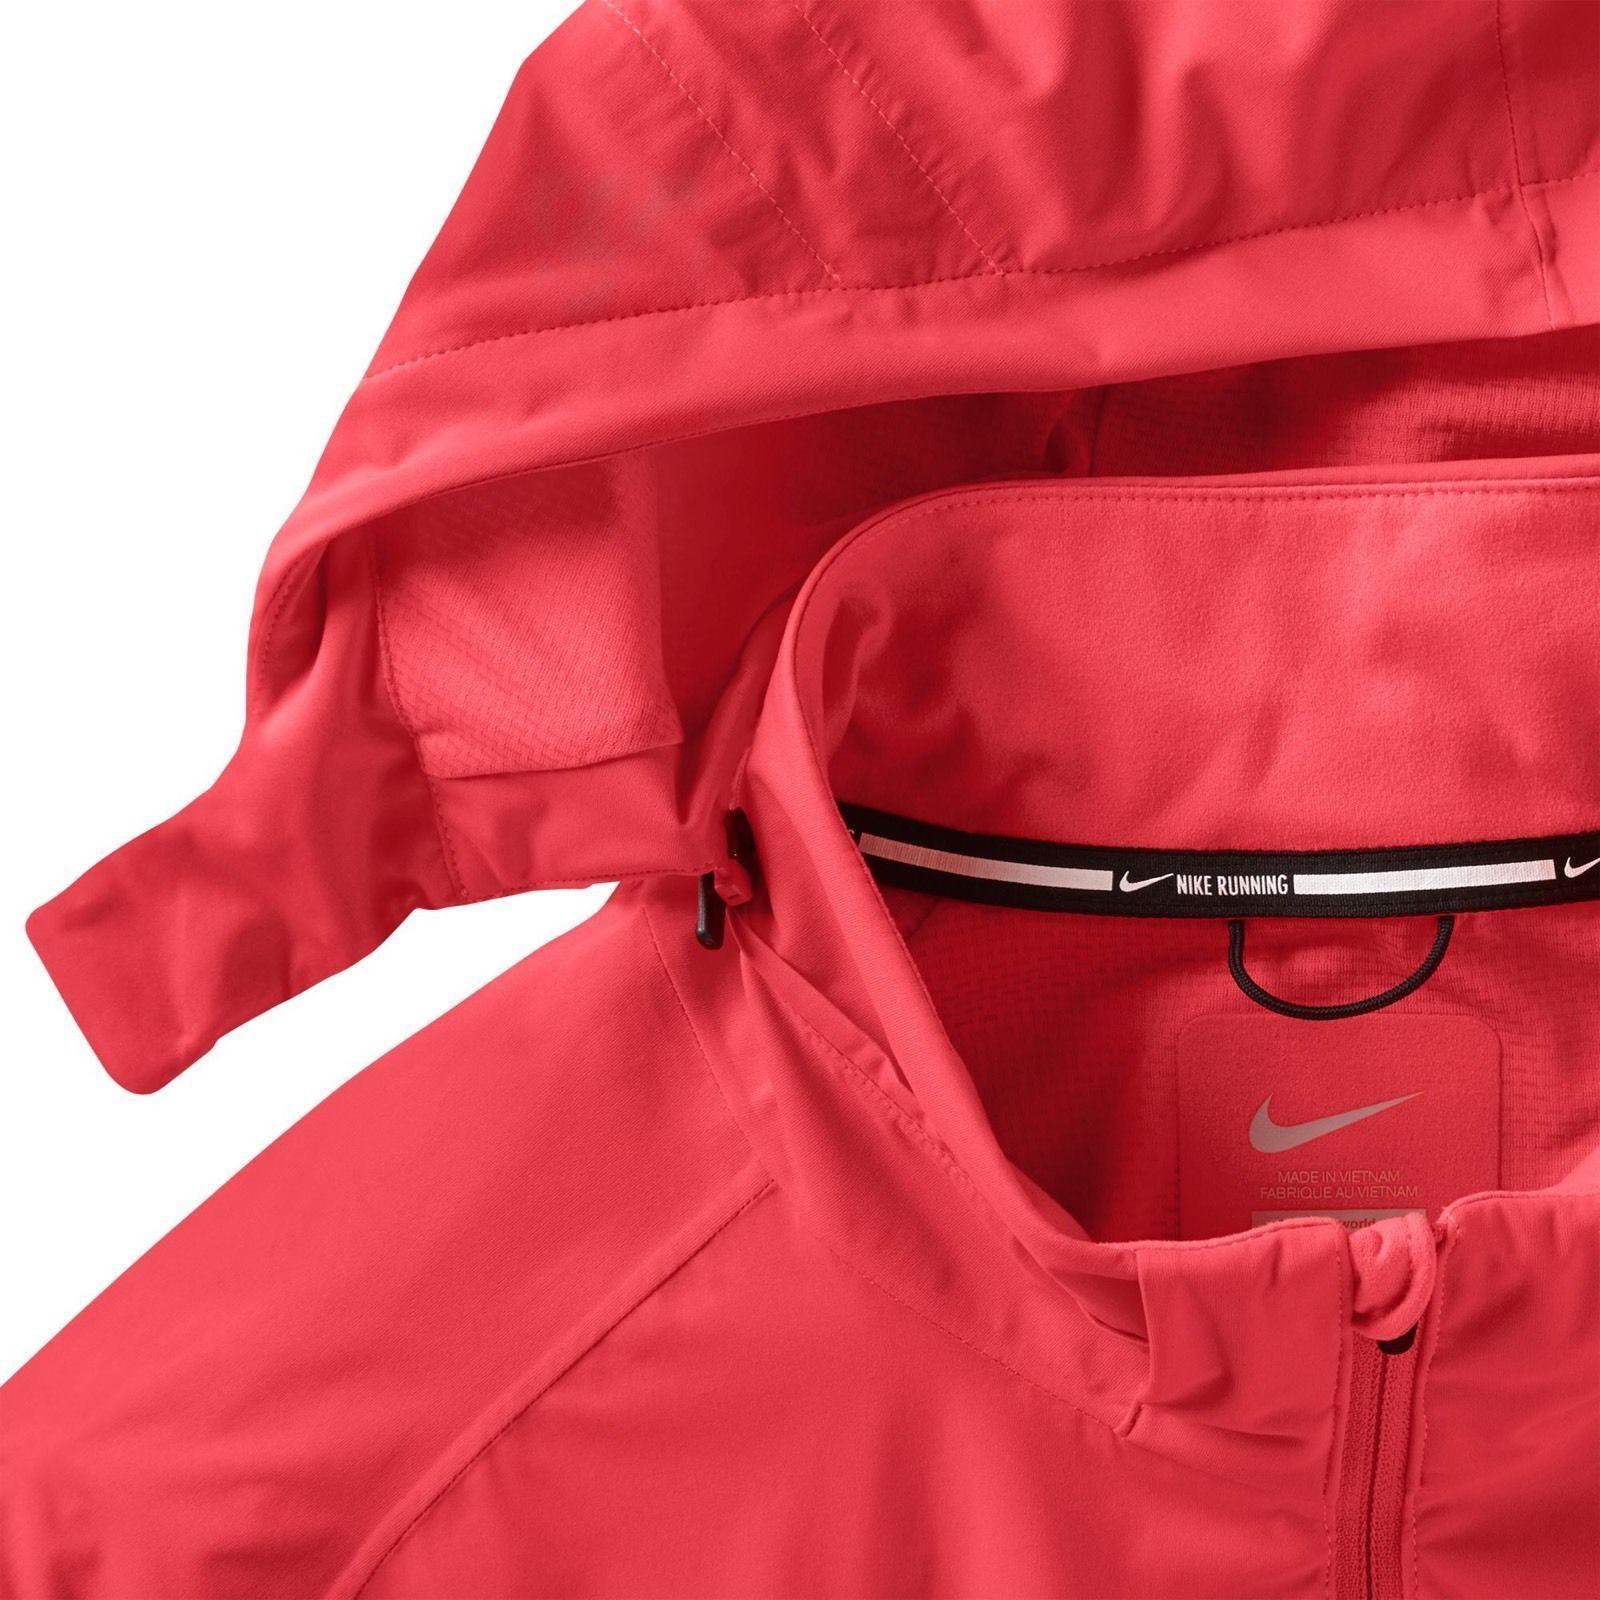 Nike 2015 Shield Light Running Jacket Men's SZ S SM 642360 671 $200 MSRP Crimson